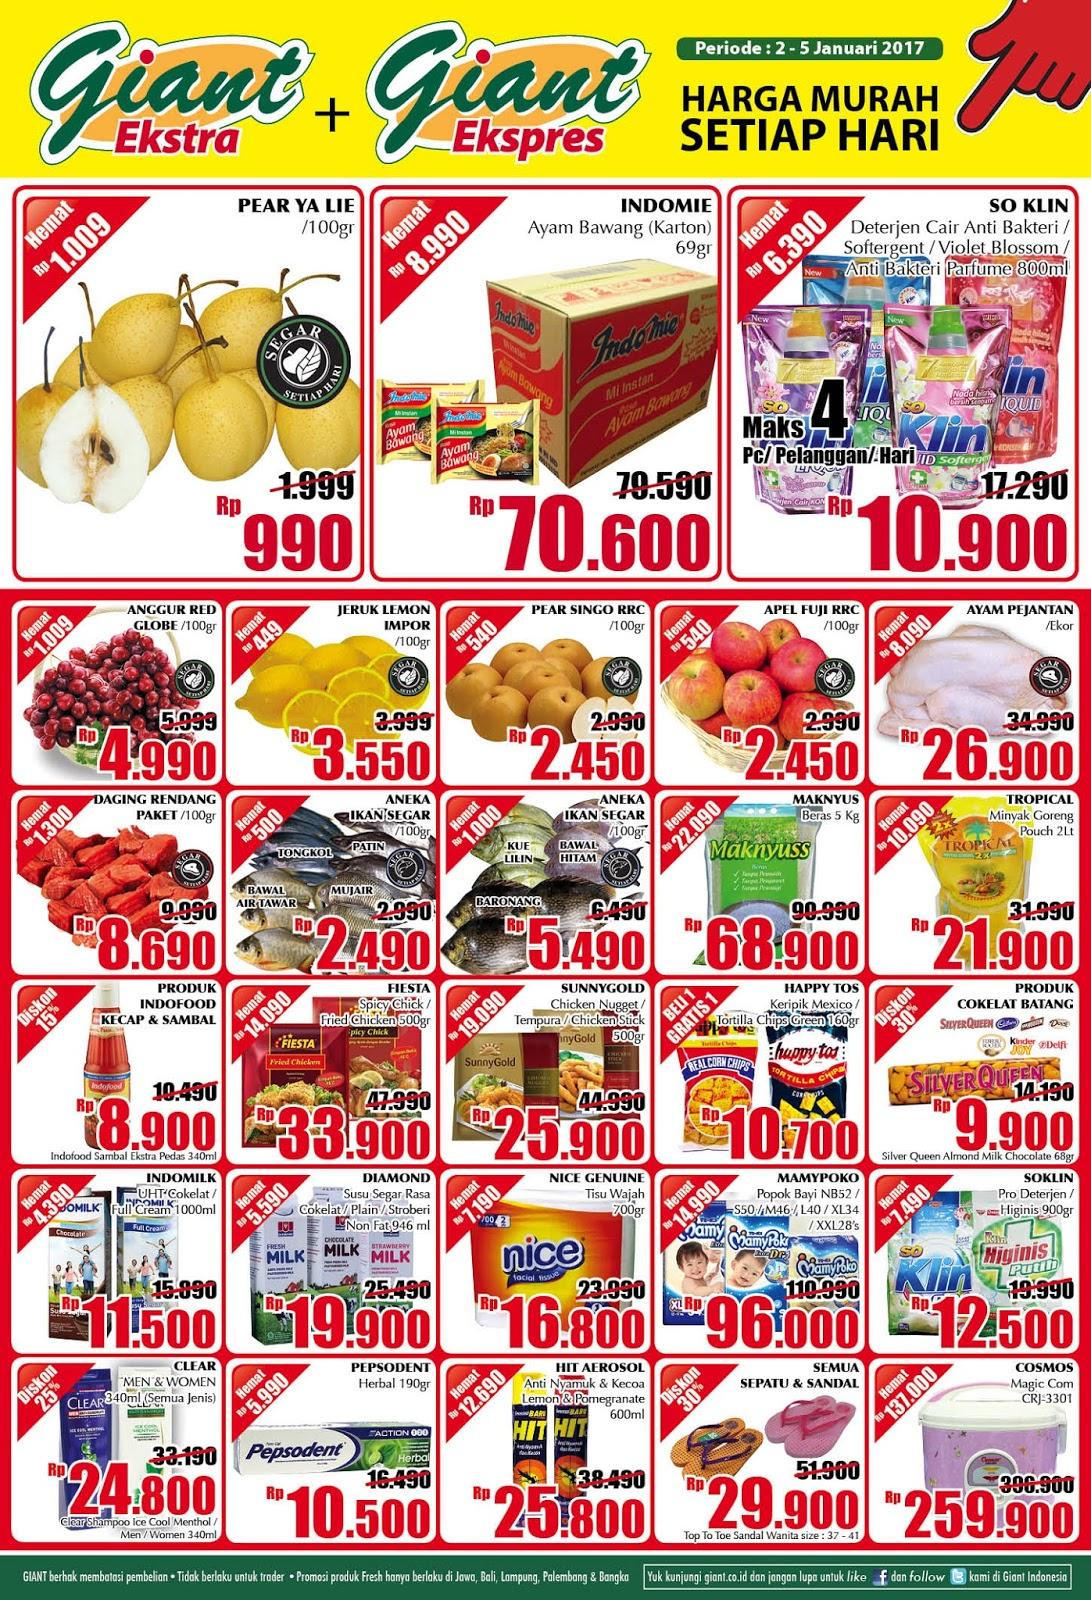 Katalog Promo Nusantara Giant Awal Pekan 2 5 Januari 2017 Voucher Superindo Rp 300000 Oke Supaya Tidaklah Terlalu Berlama Lama Lagi Segera Saja Kita Simak Product Apa Sajakah Yang Masuk Dalam Daftar